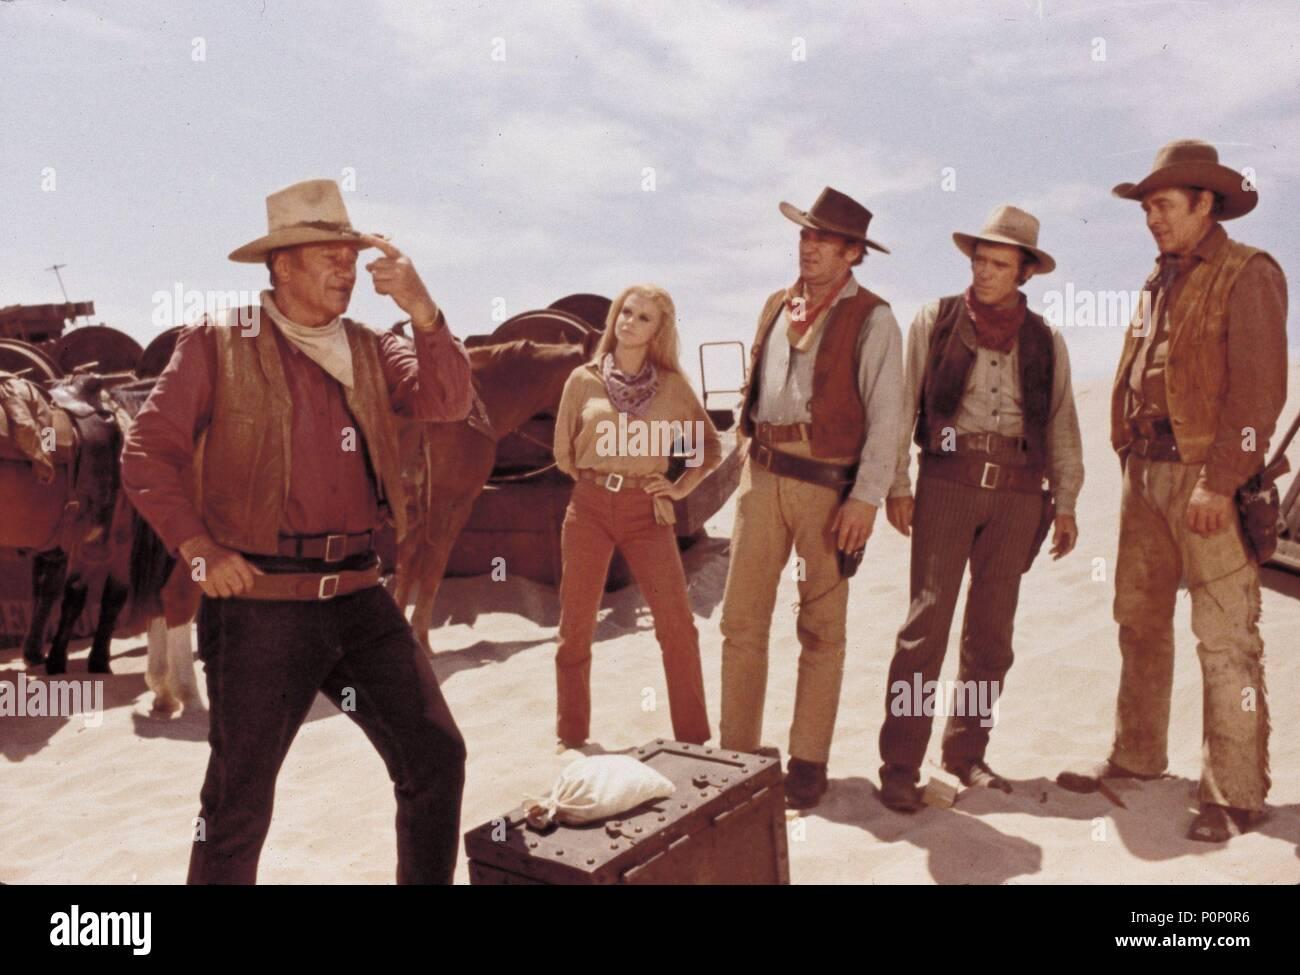 Original Film Title: THE TRAIN ROBBERS.  English Title: THE TRAIN ROBBERS.  Film Director: BURT KENNEDY.  Year: 1973.  Stars: JOHN WAYNE. Credit: WARNER BROTHERS / Album - Stock Image